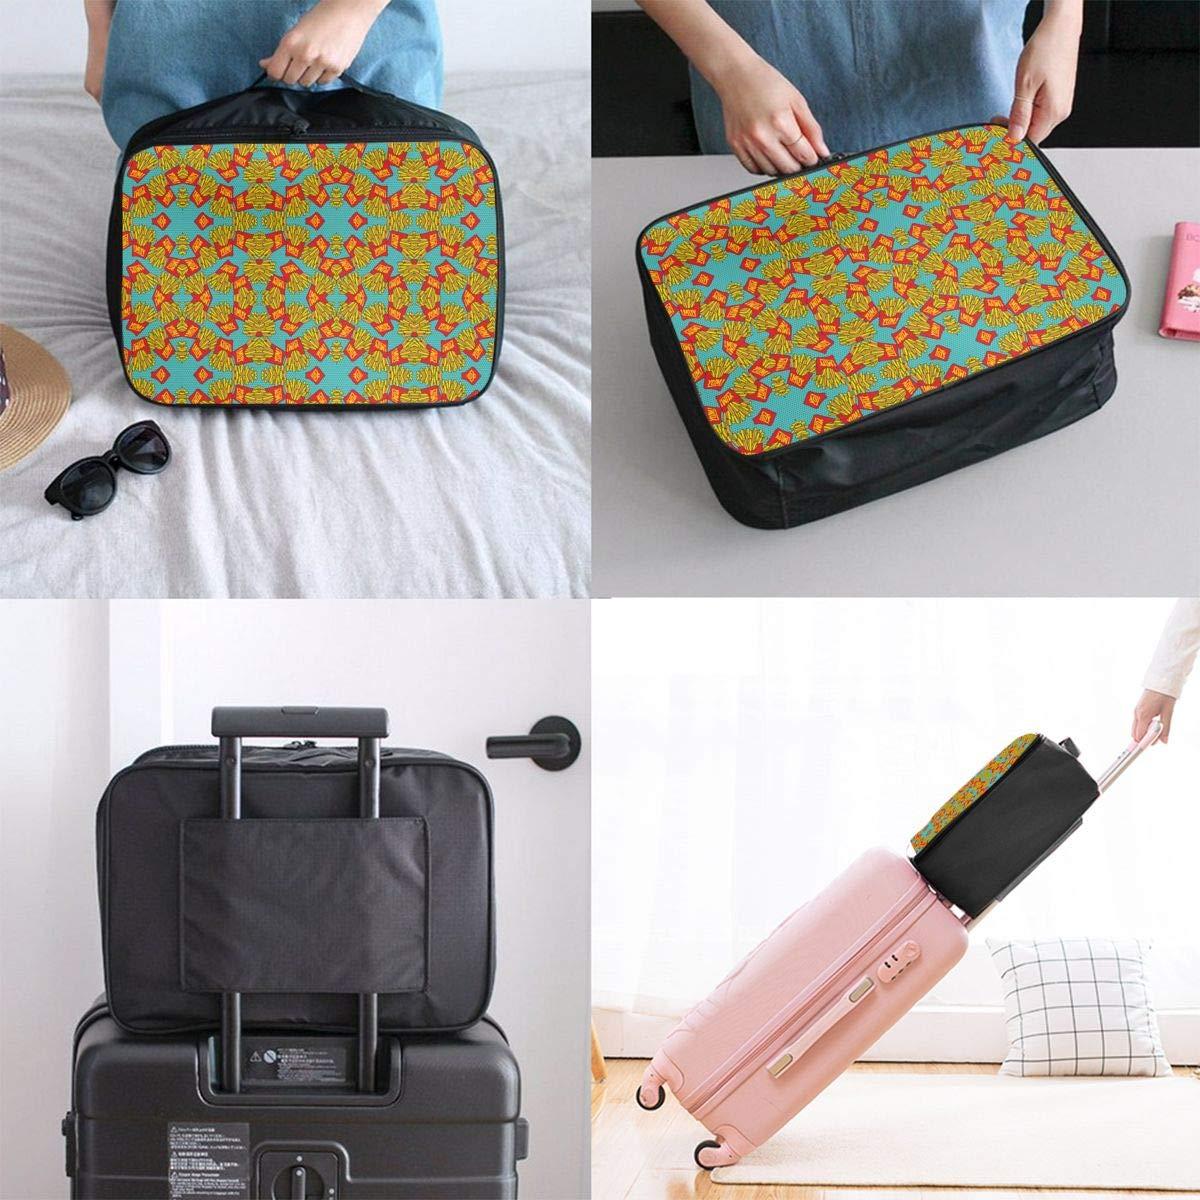 Travel Luggage Duffle Bag Lightweight Portable Handbag French Fries Burger Large Capacity Waterproof Foldable Storage Tote